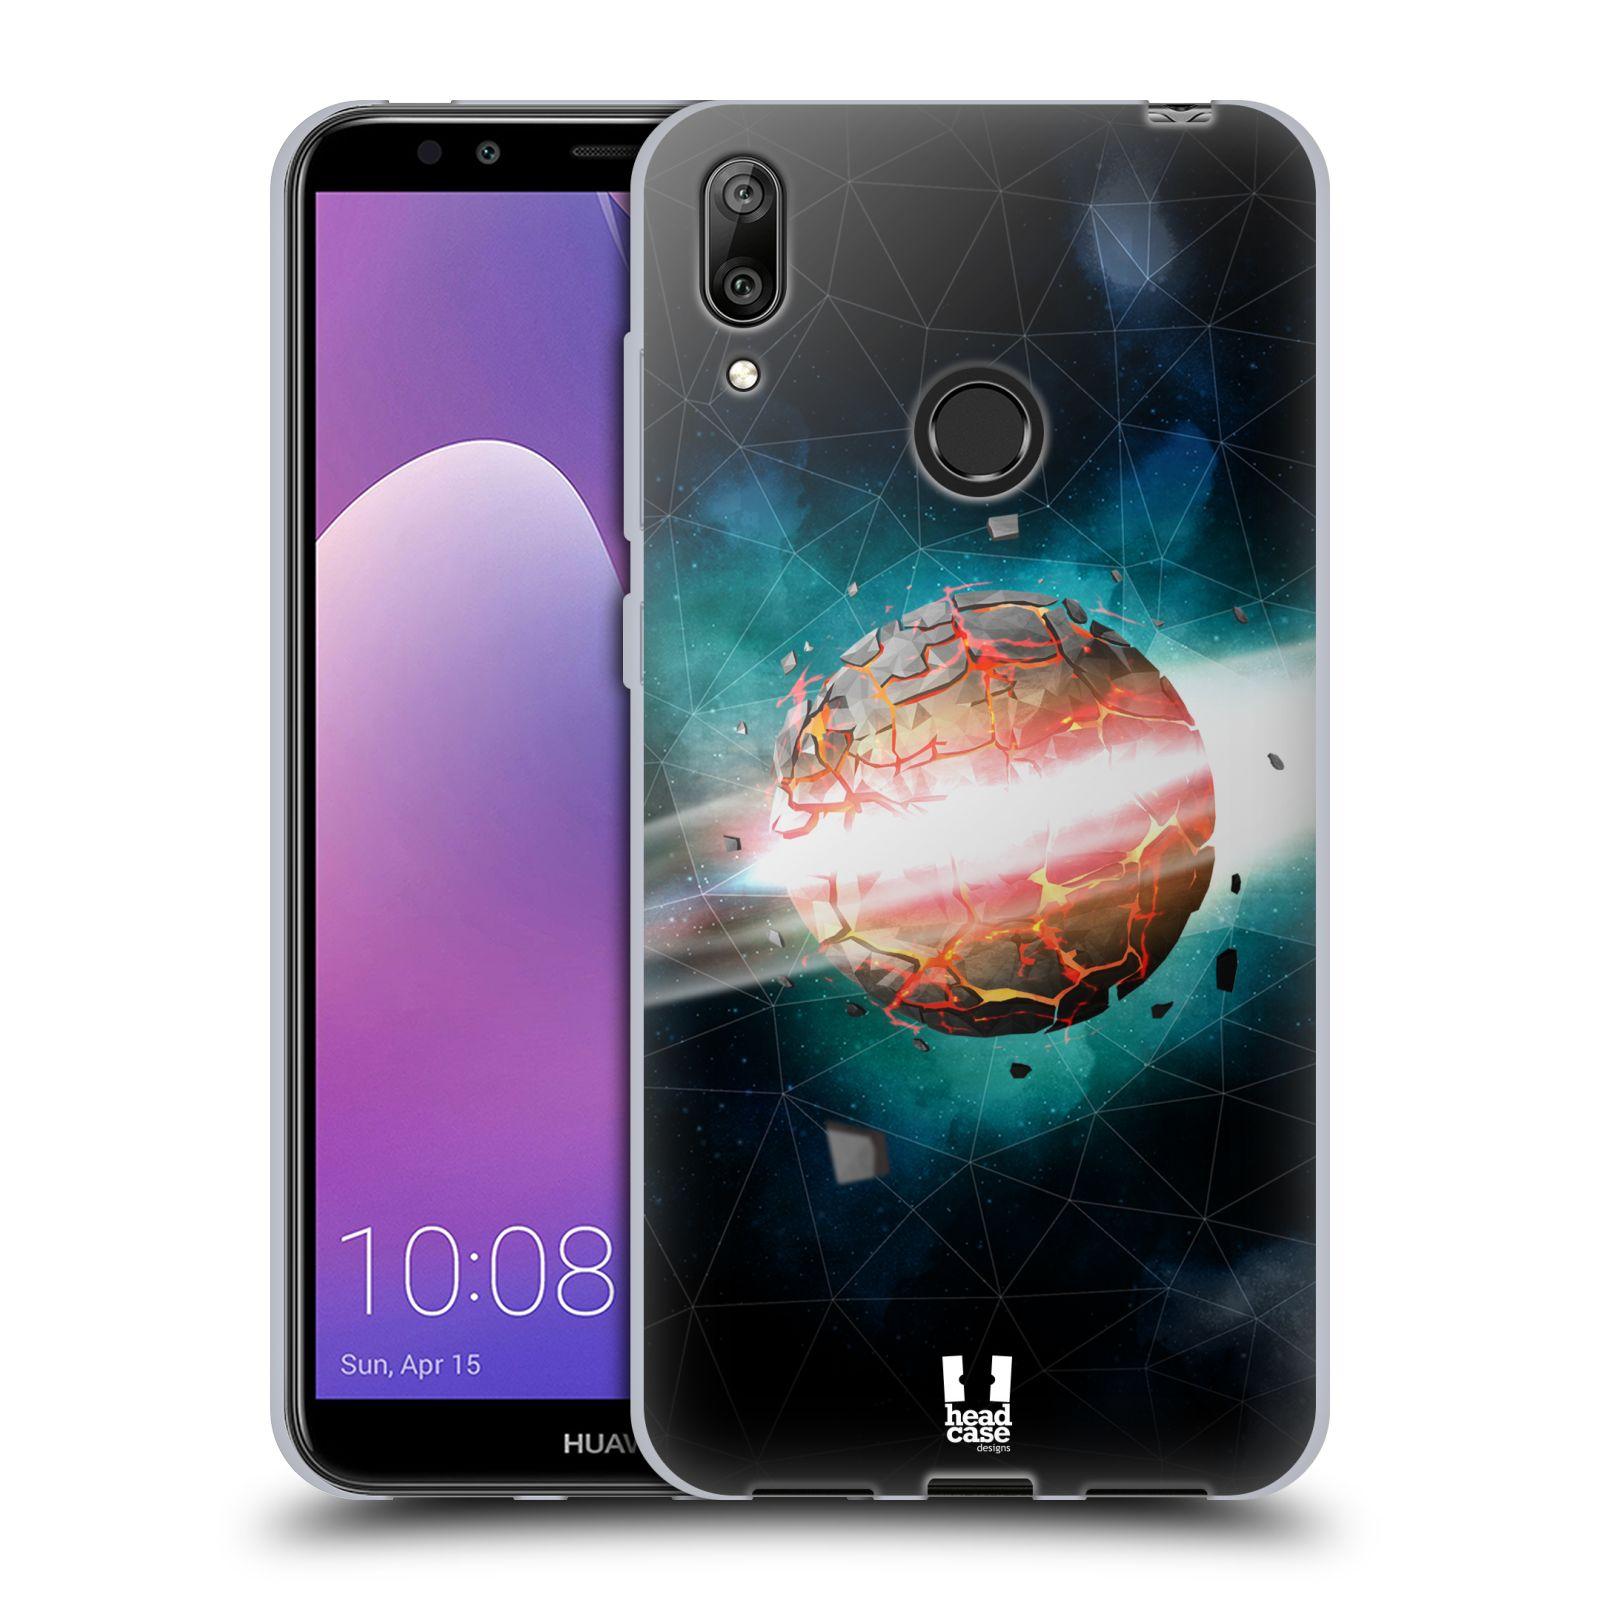 Silikonové pouzdro na mobil Huawei Y7 (2019) - Head Case - UNIVERSE EXPLOSION